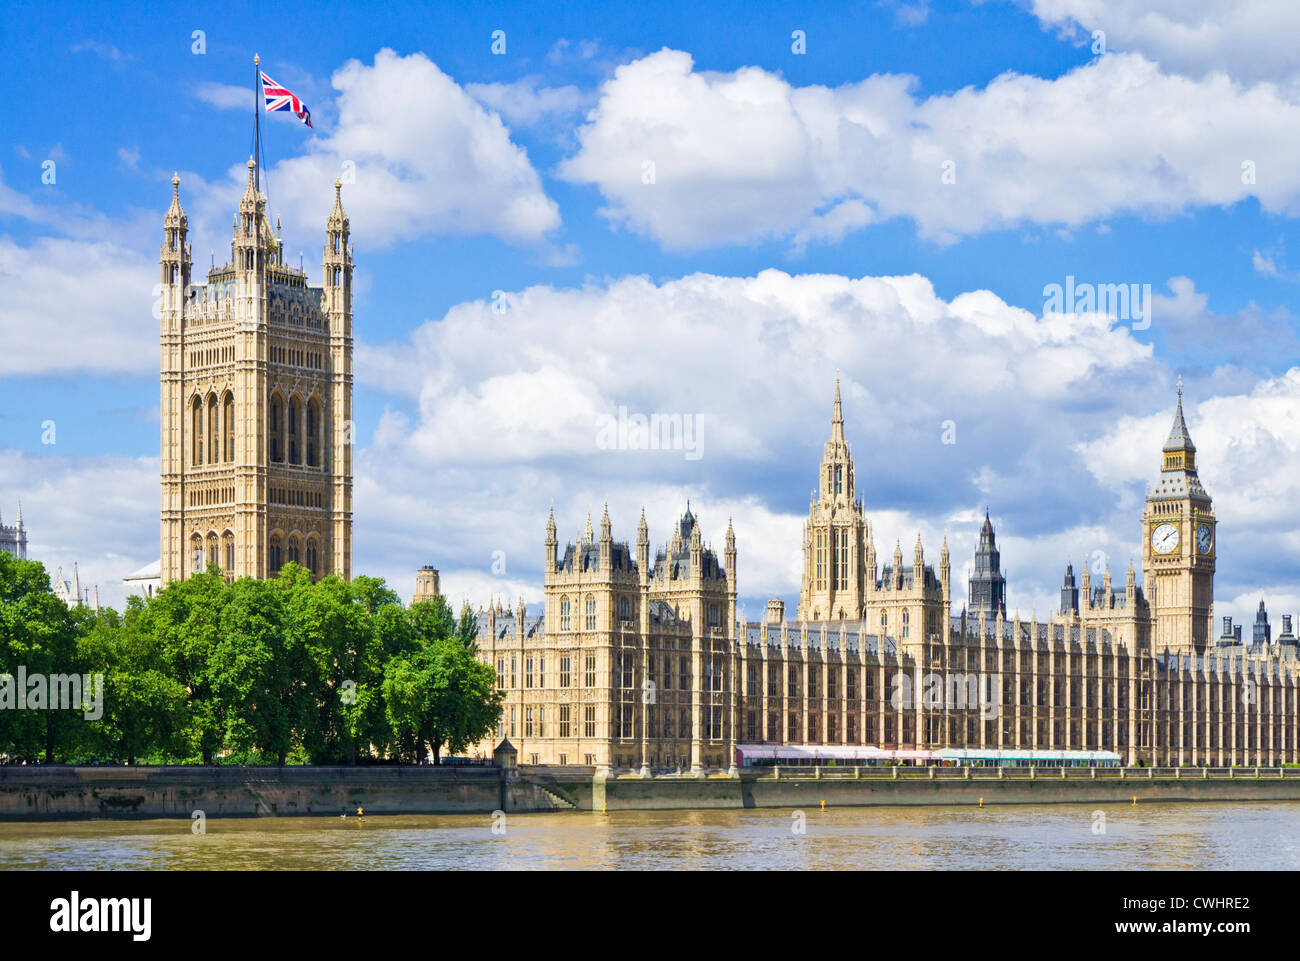 London Skyline London Häuser des Parlaments London Big Ben London Stadt von London Stadt London Stadtbild Anschluß Stockbild